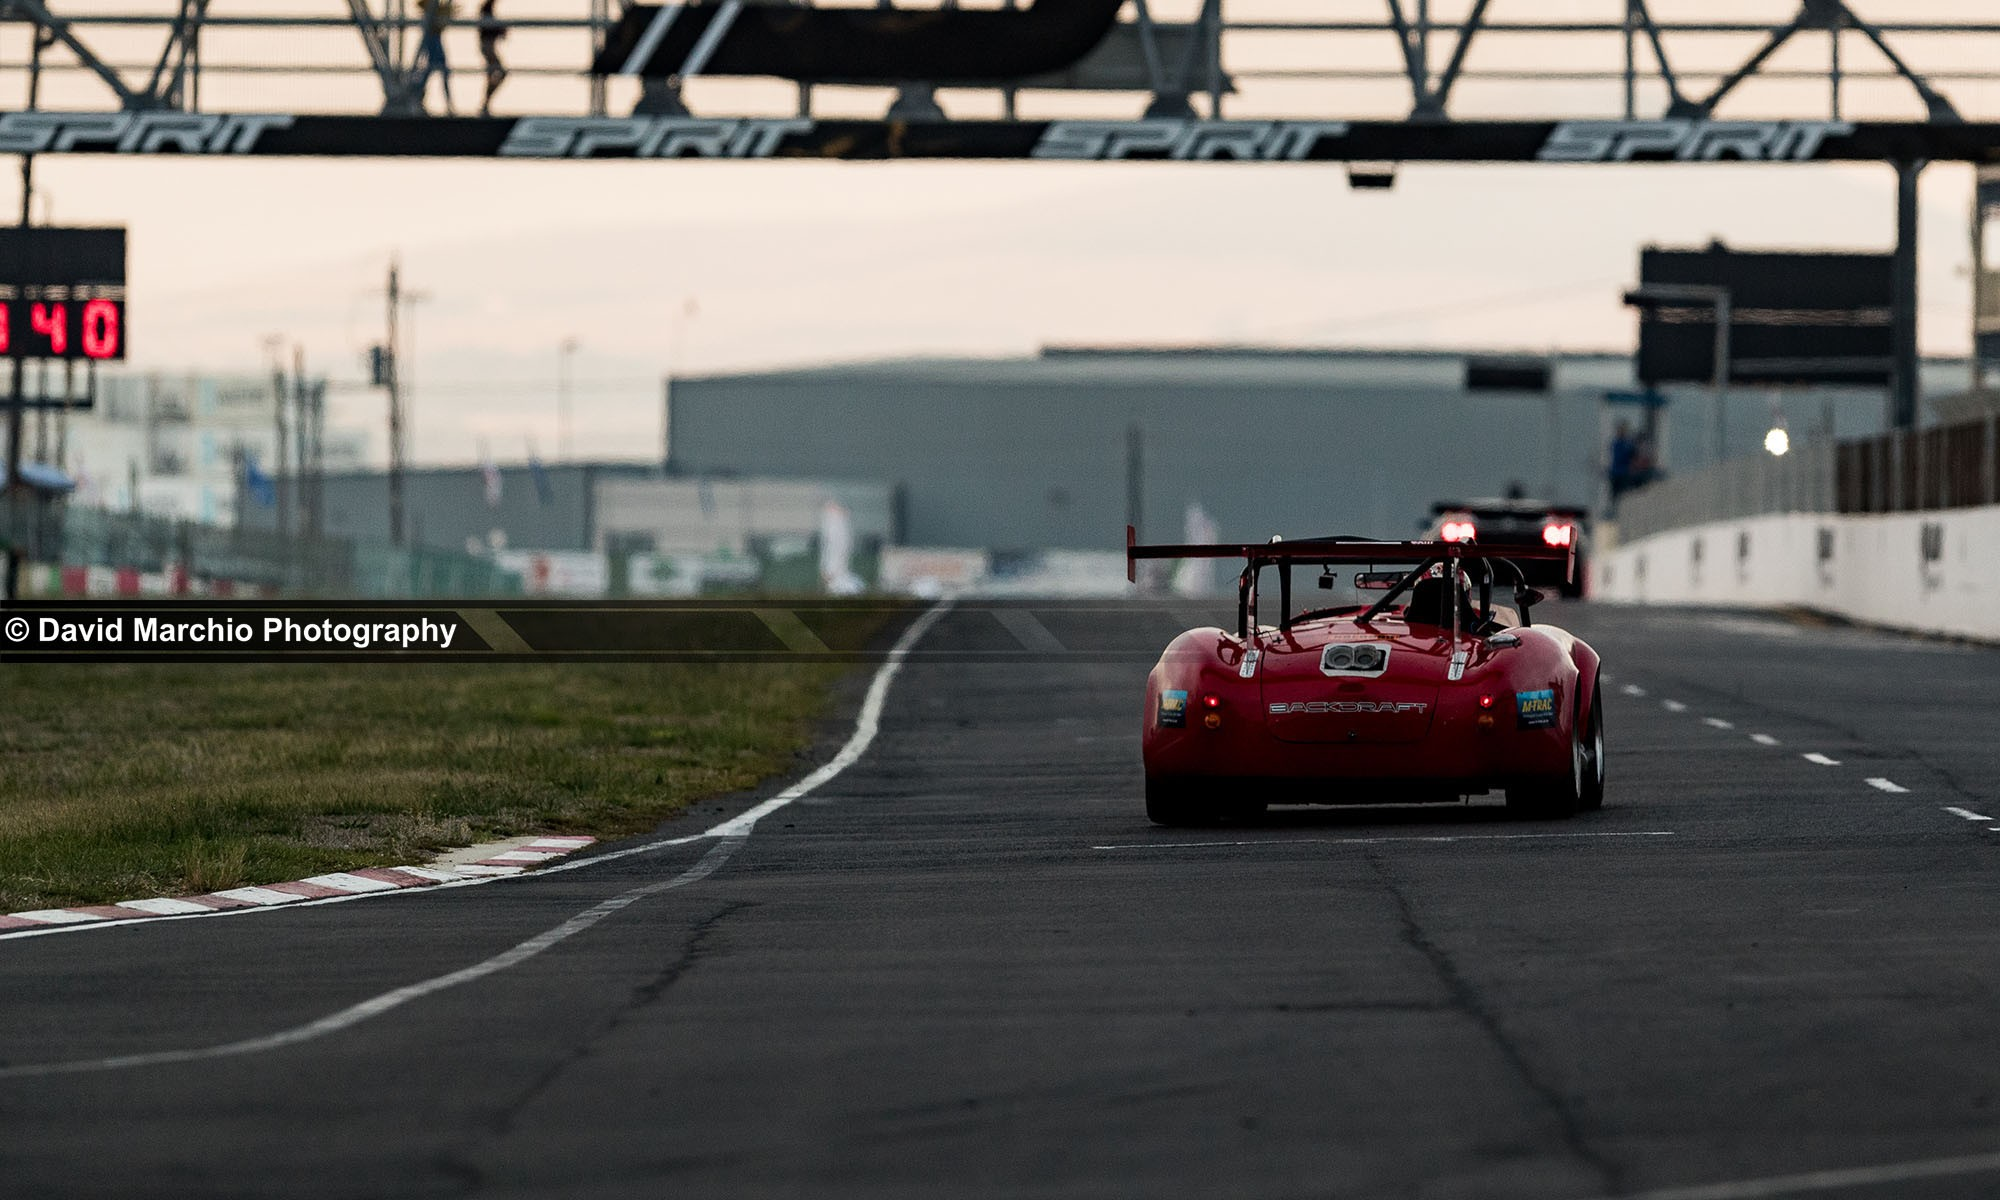 The Backdraft Roaster of team Backdraft racing, accelerates down the main straight of Killarney Internation Raceway